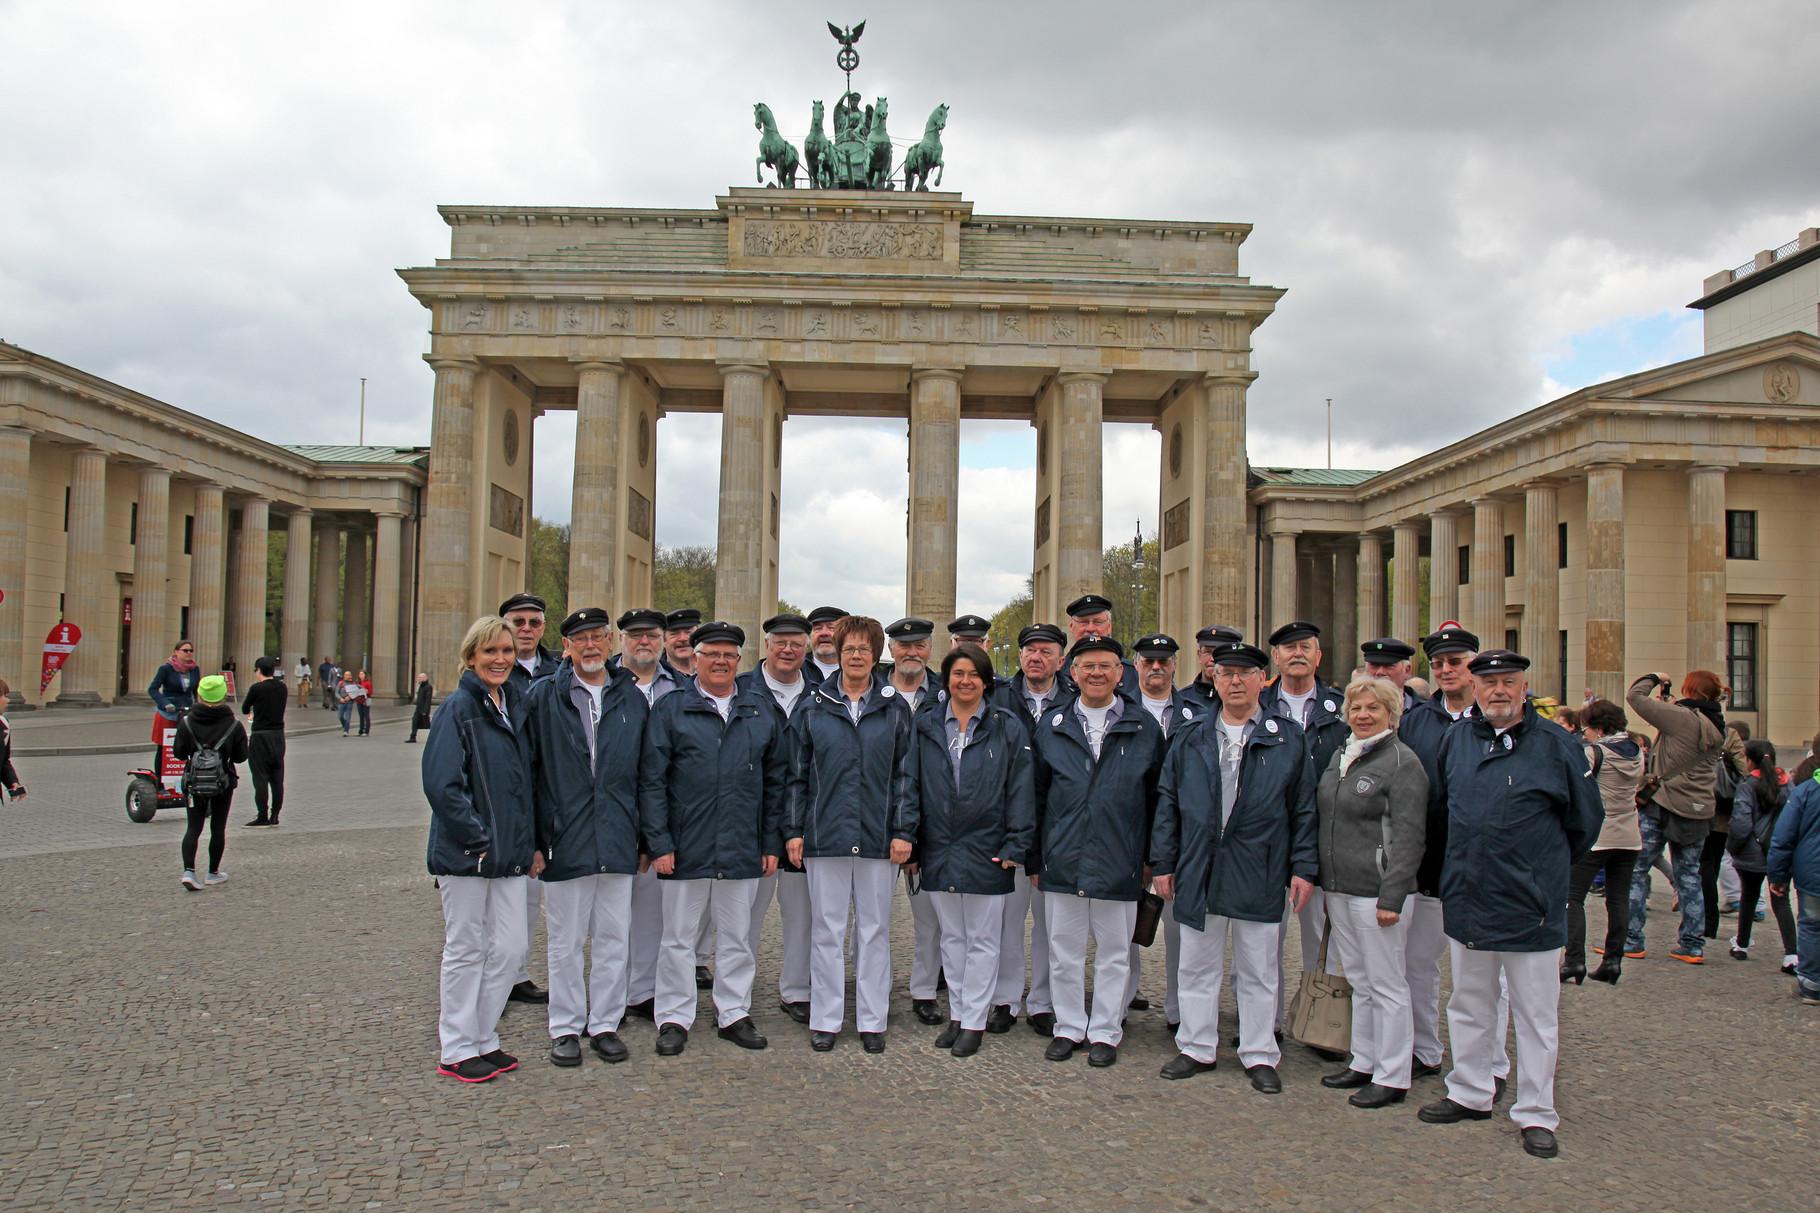 Am Brandenburger Tor sangen wir...............